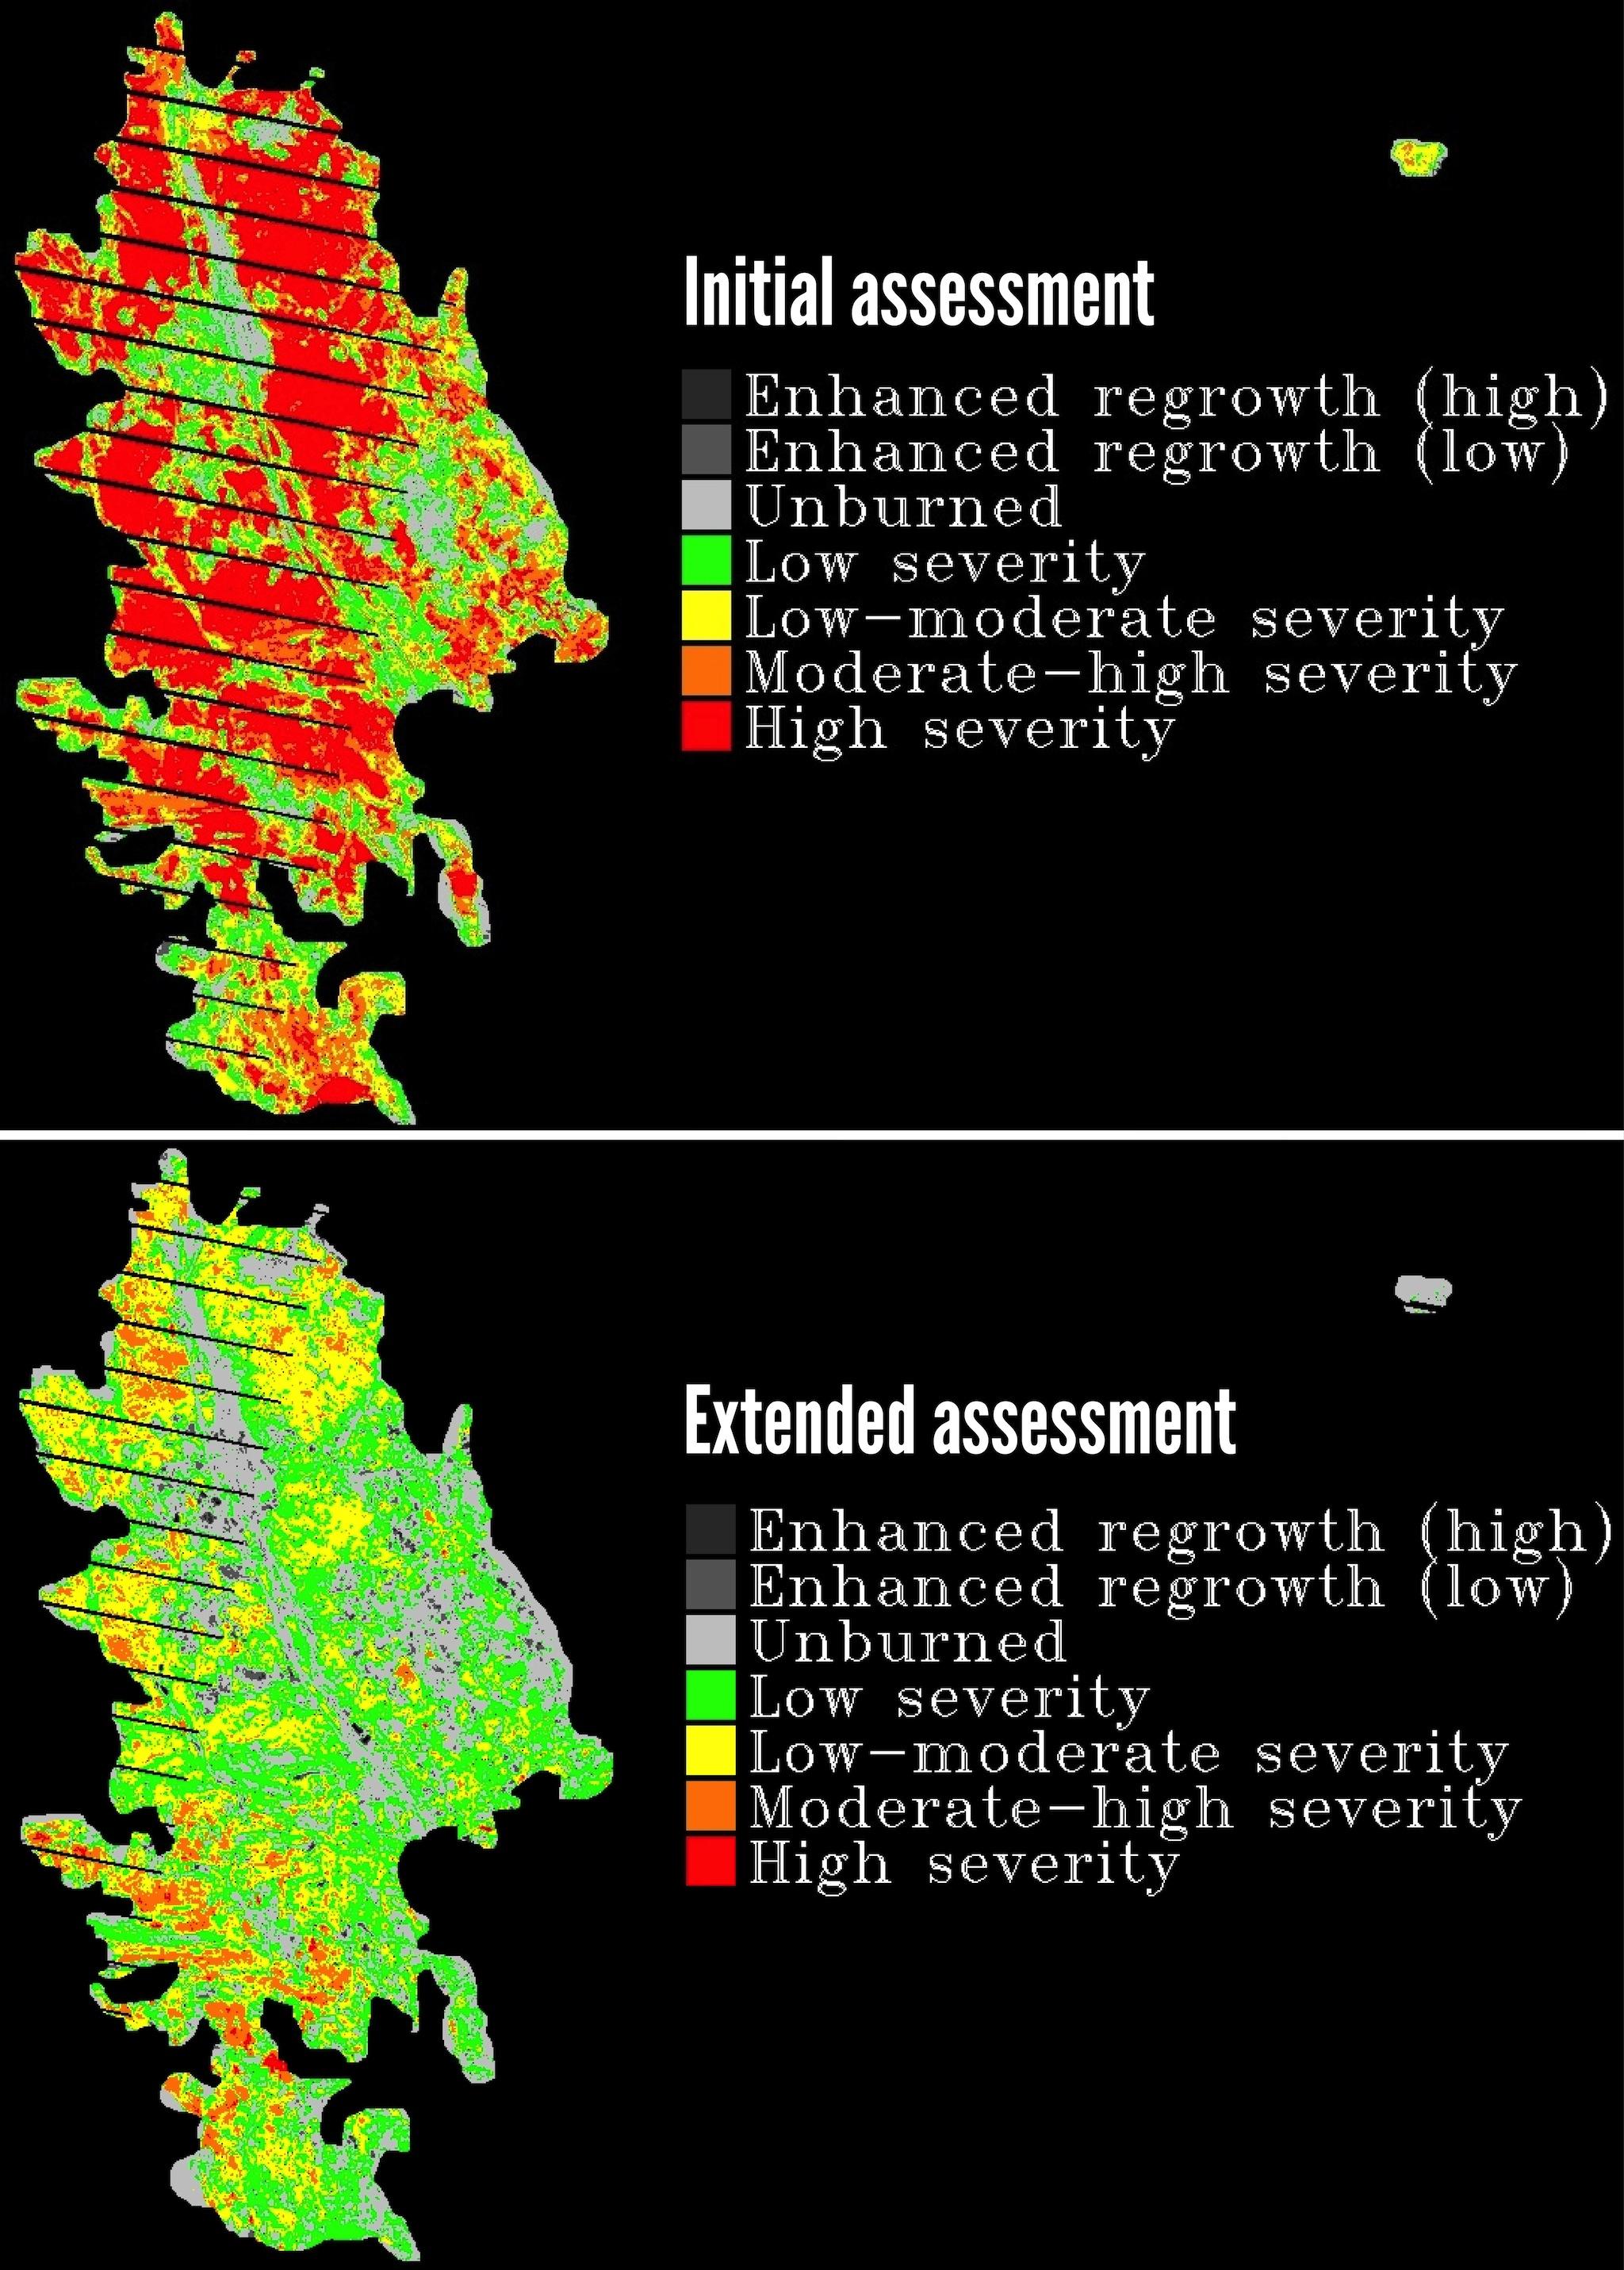 Extended assessment false color image